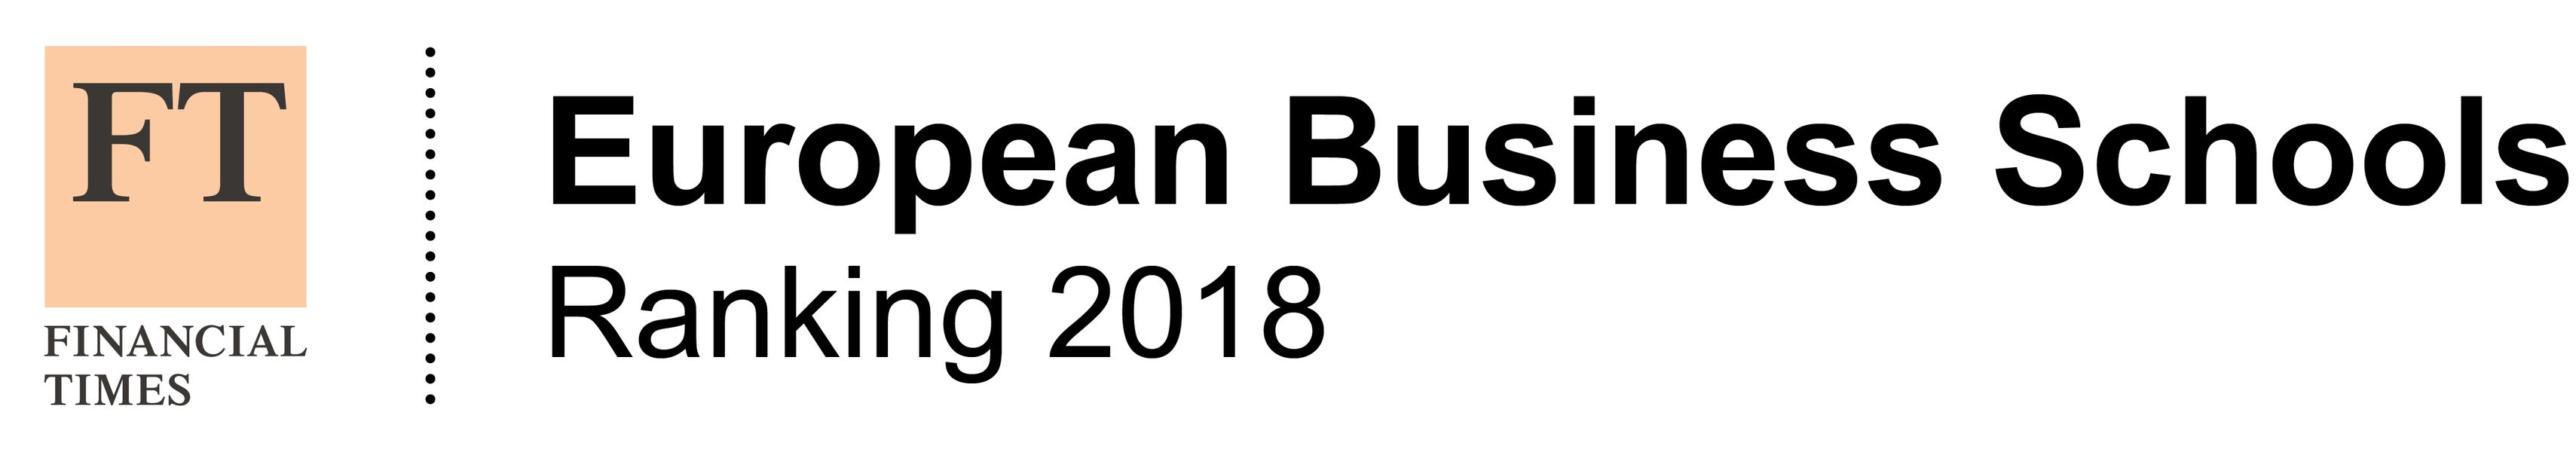 FT European Business School 2018